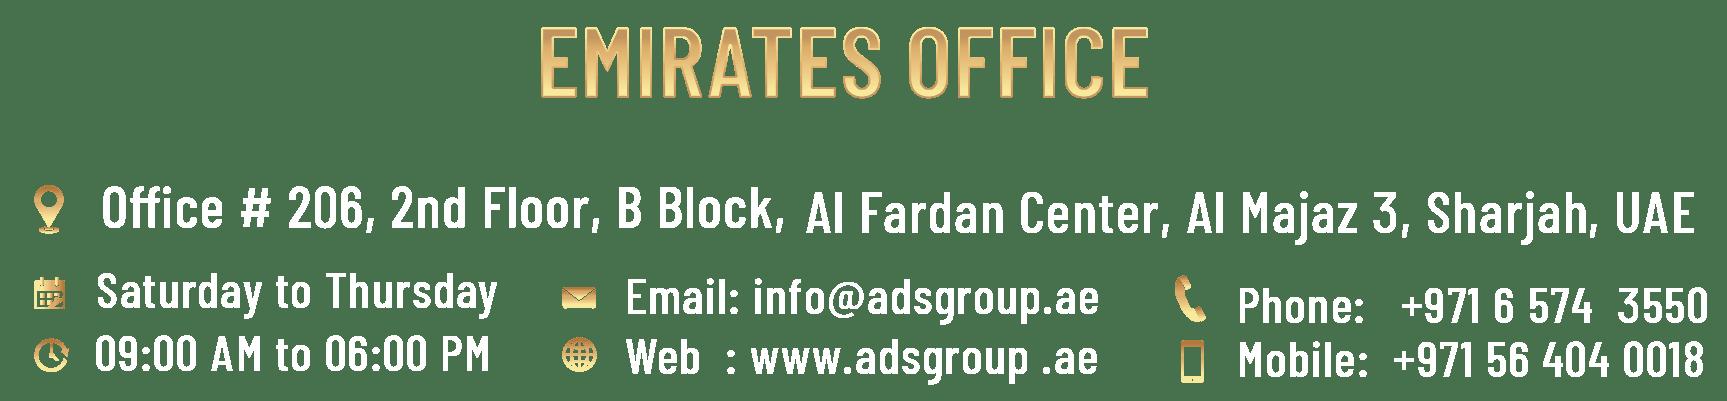 emirates office